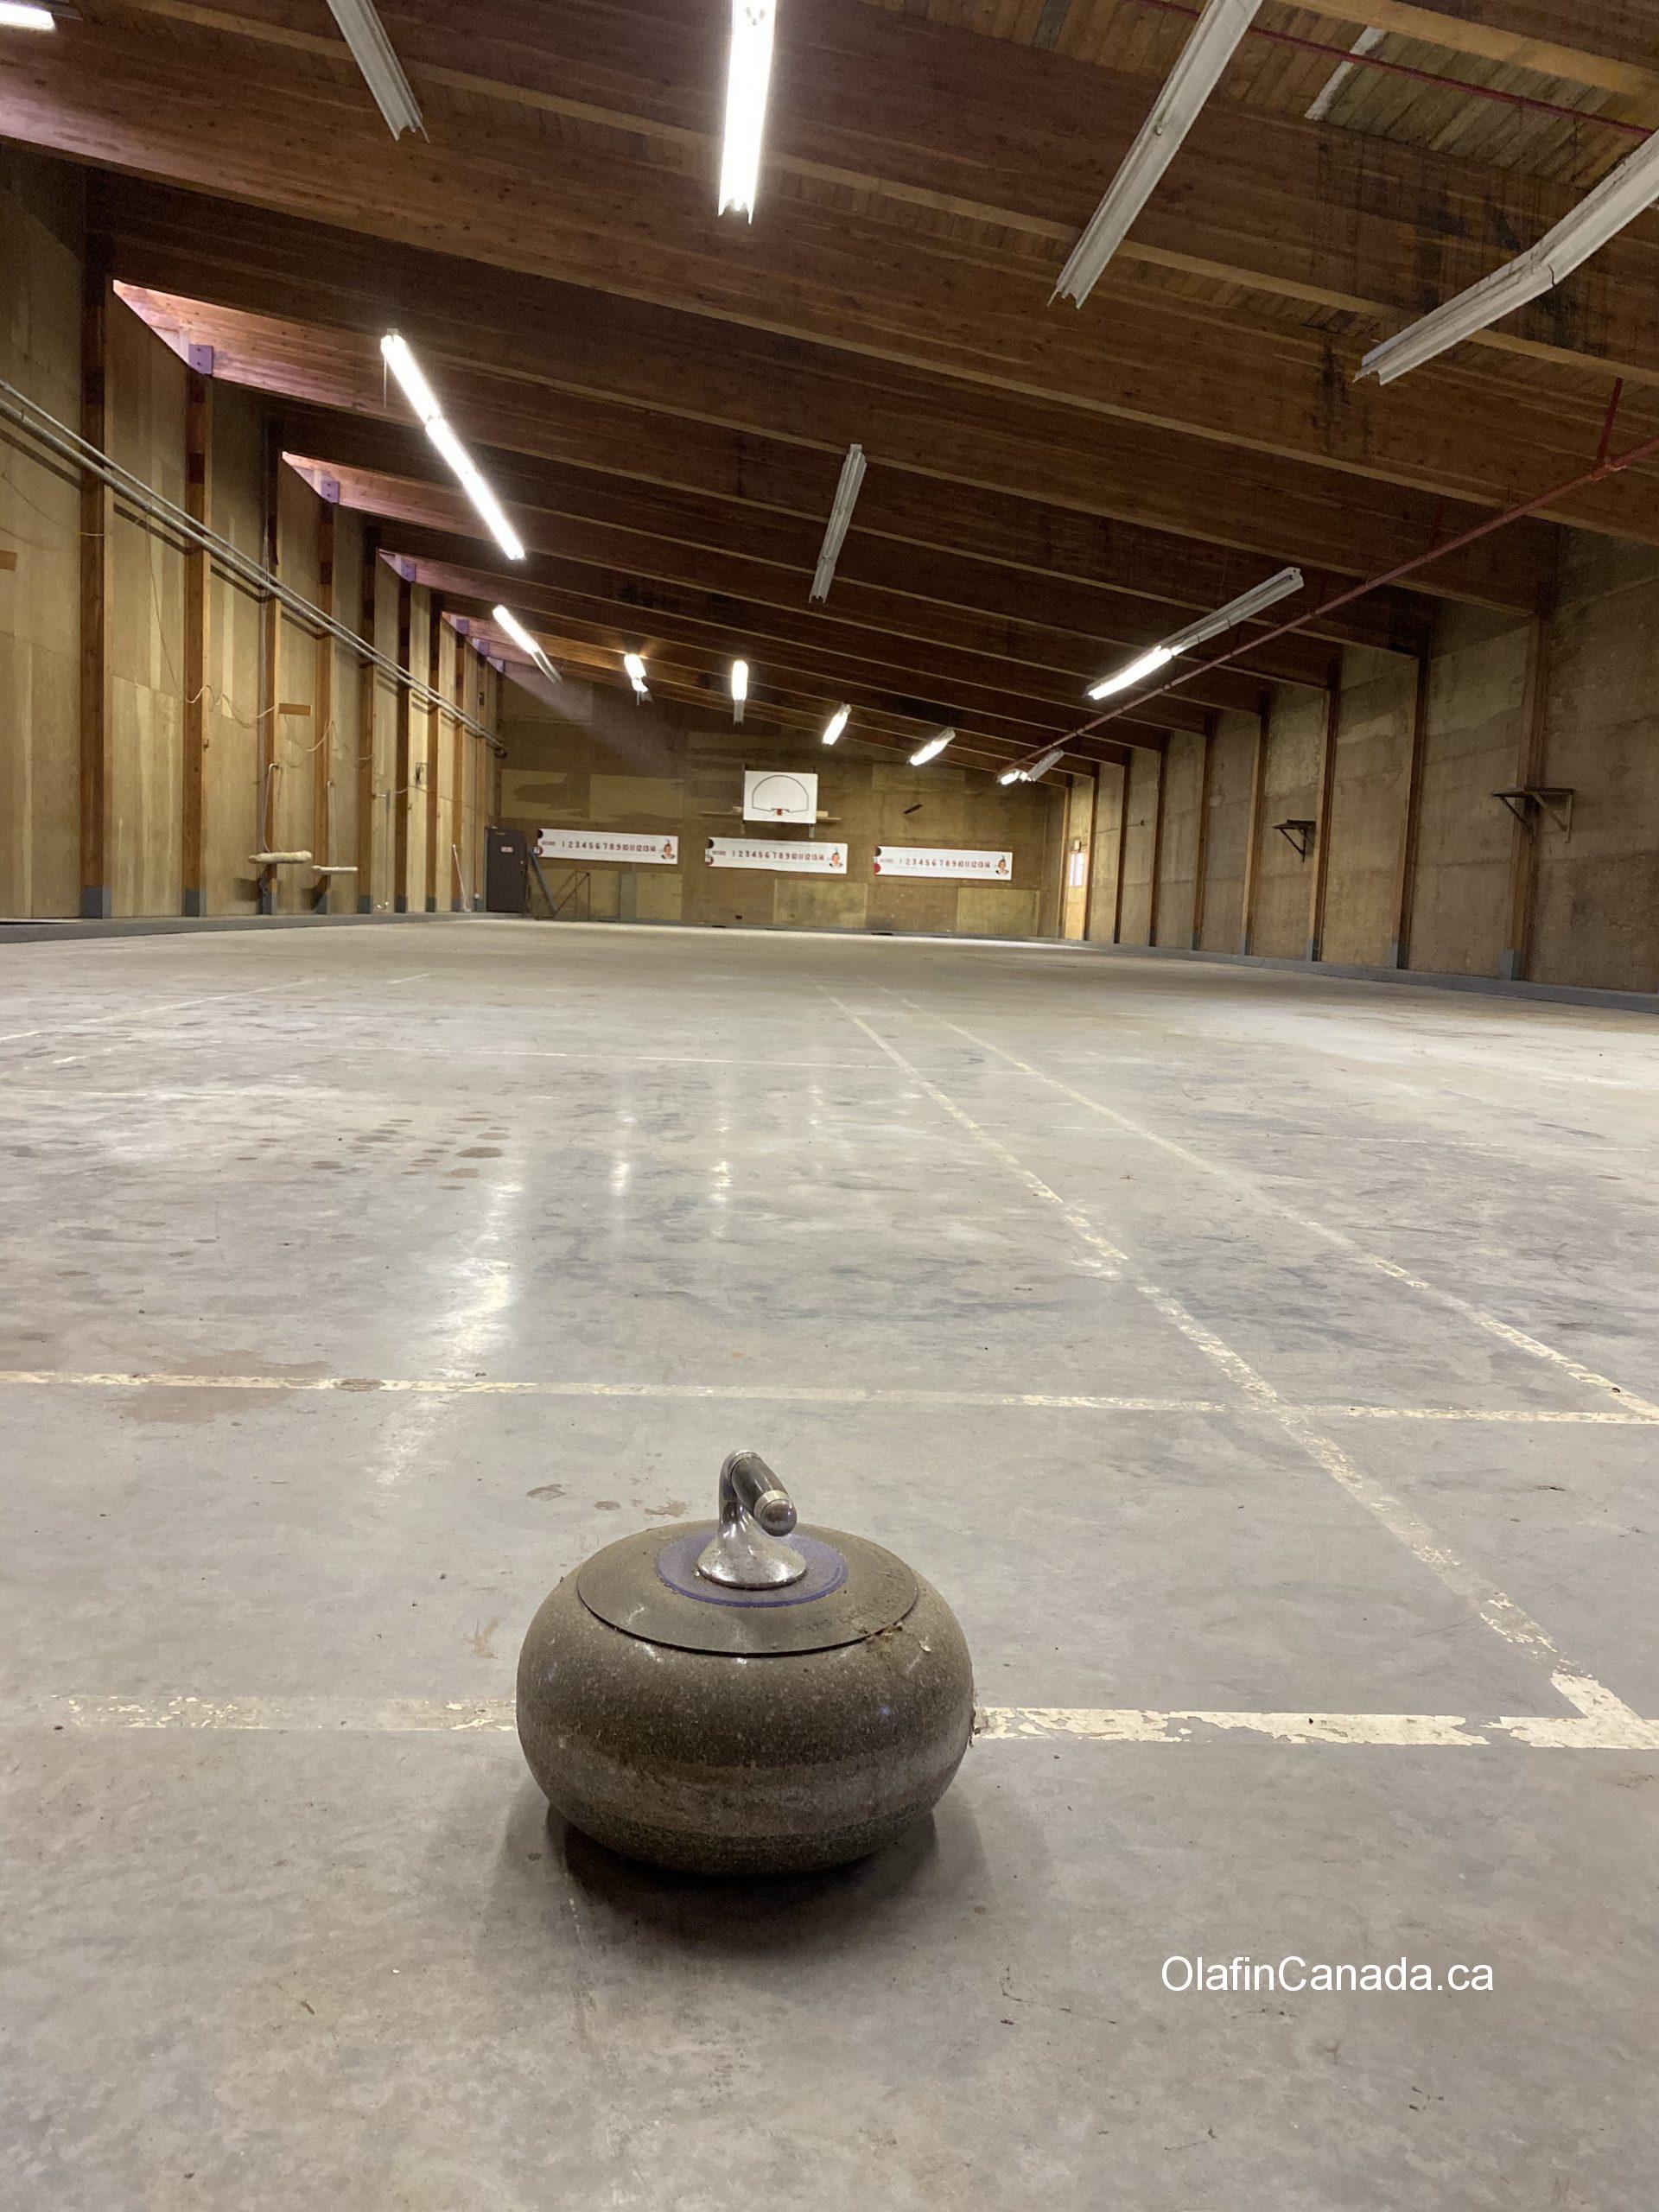 Abandoned curling rink in Kitsault #olafincanada #britishcolumbia #discoverbc #abandonedbc #kitsault #curling